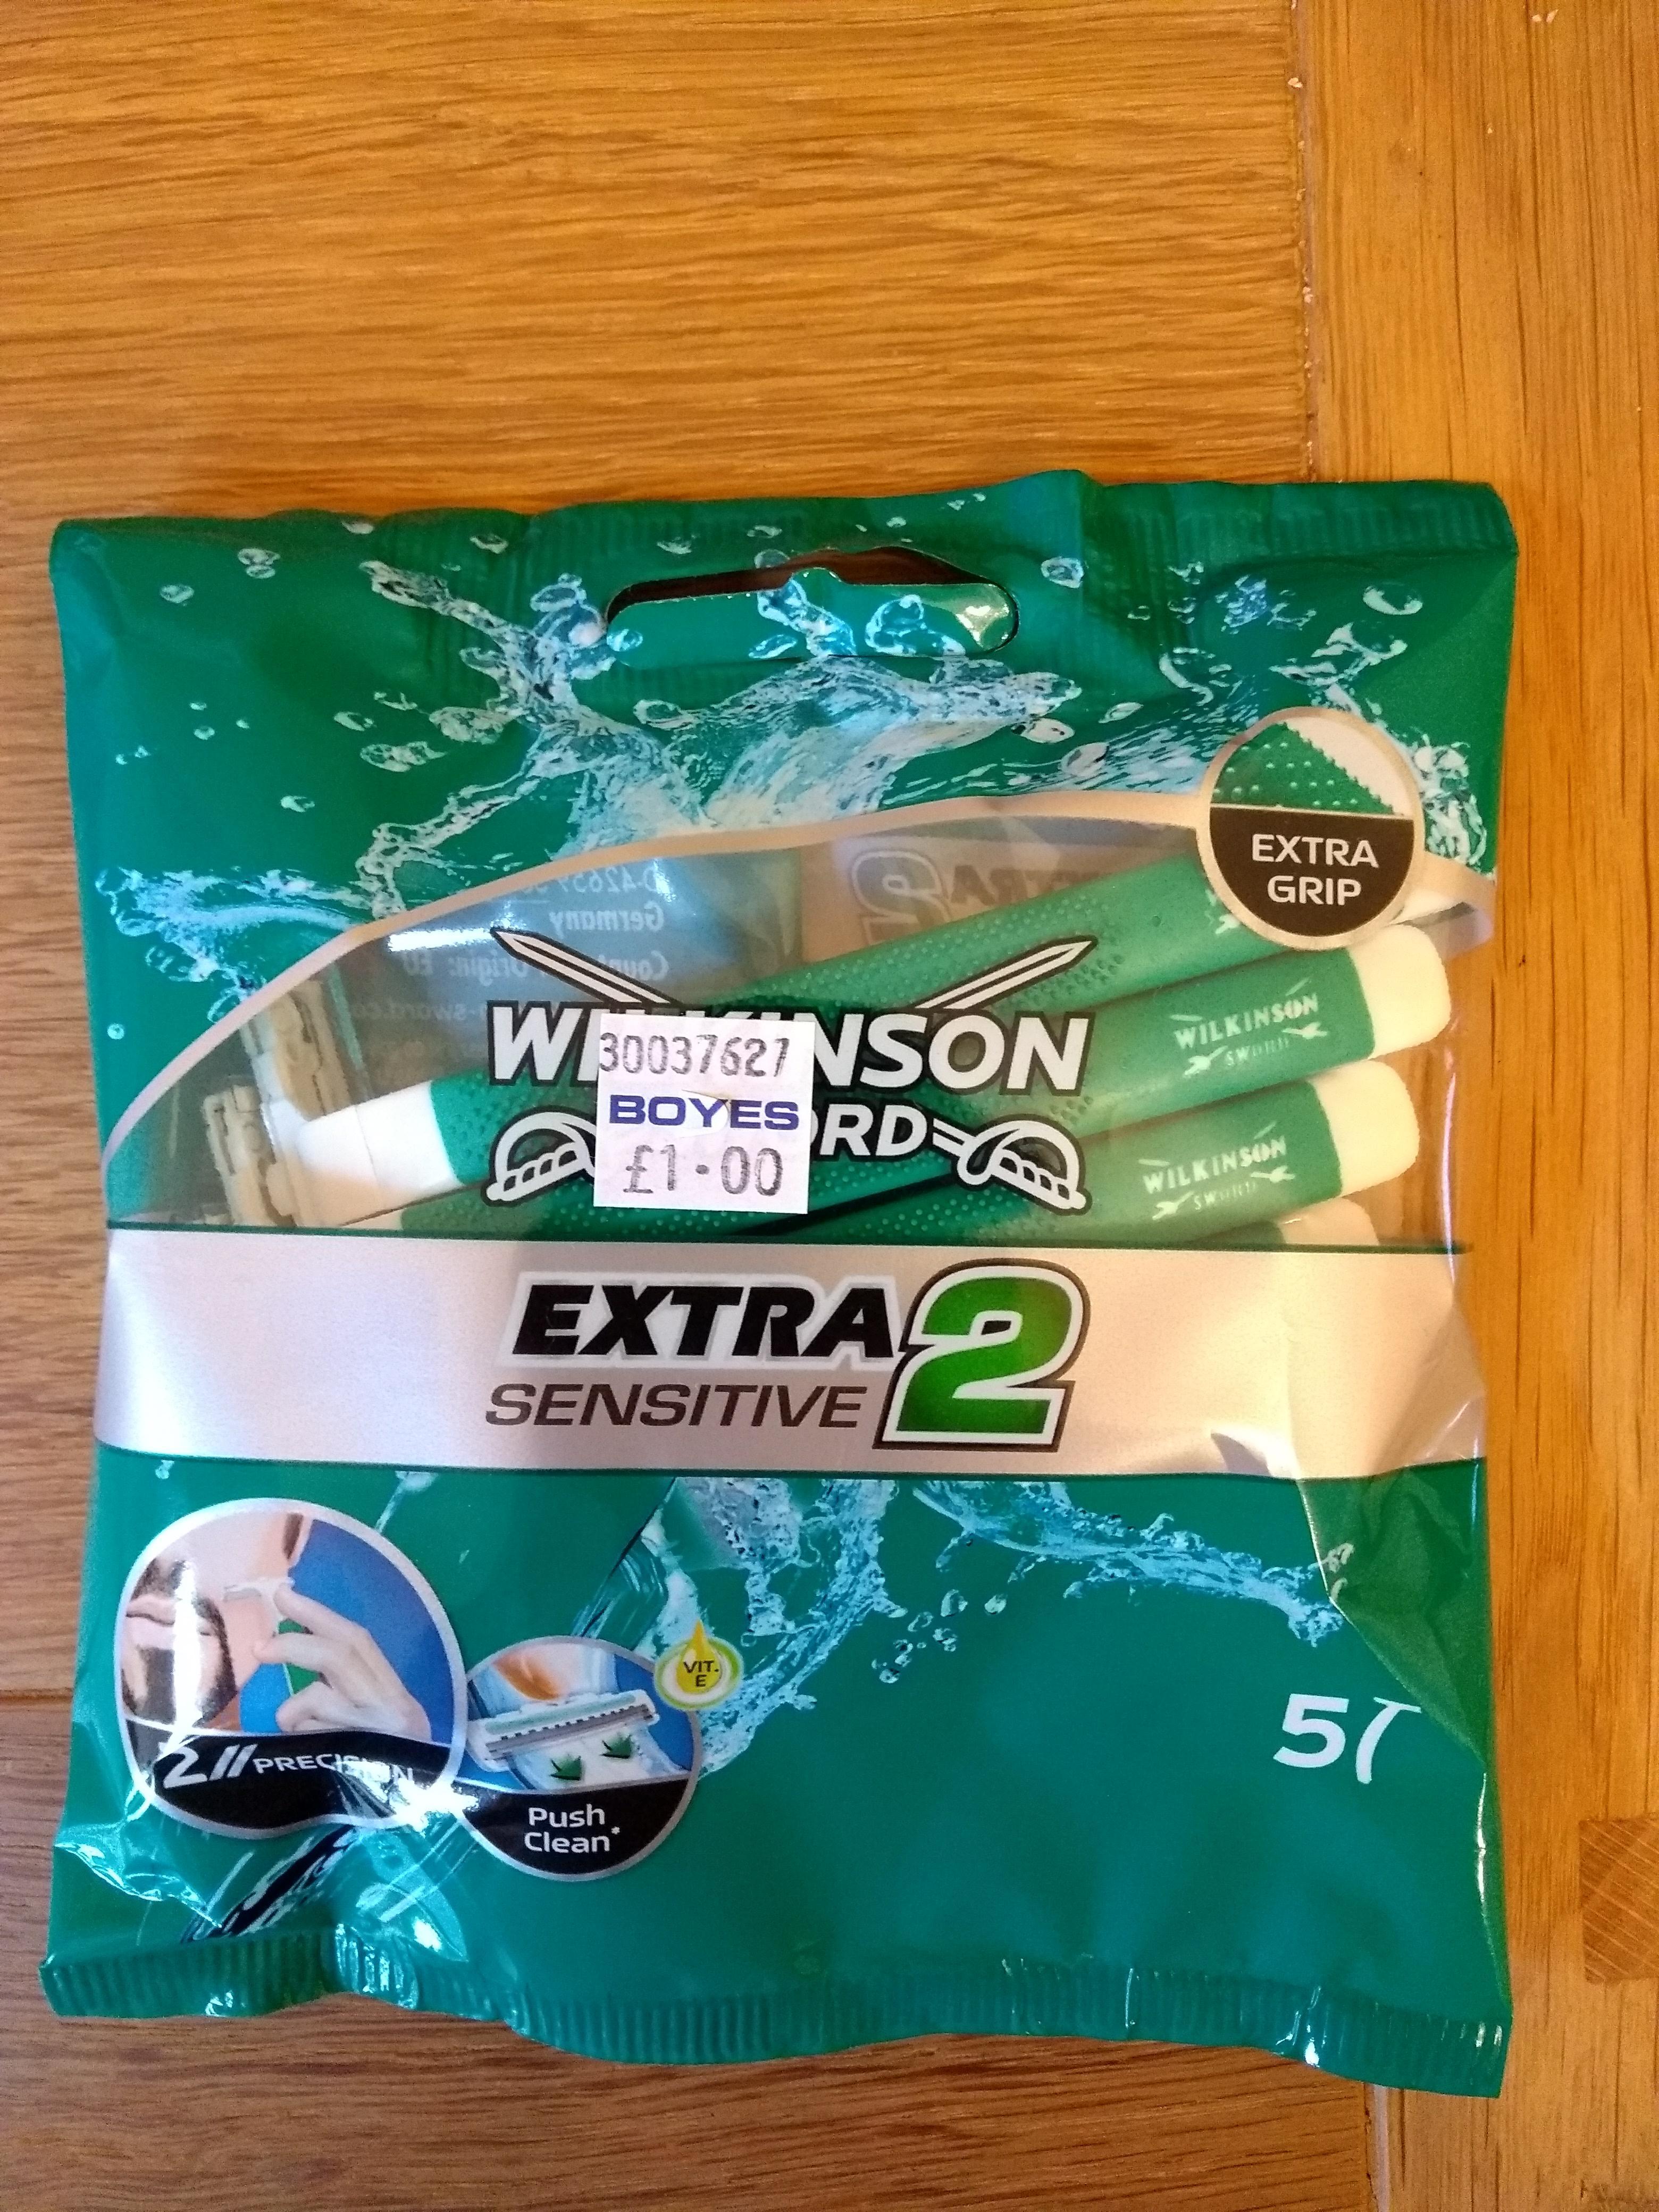 Wilkinson Sword Extra Sensitive 2 pack of 5 blades £1 - BOYES